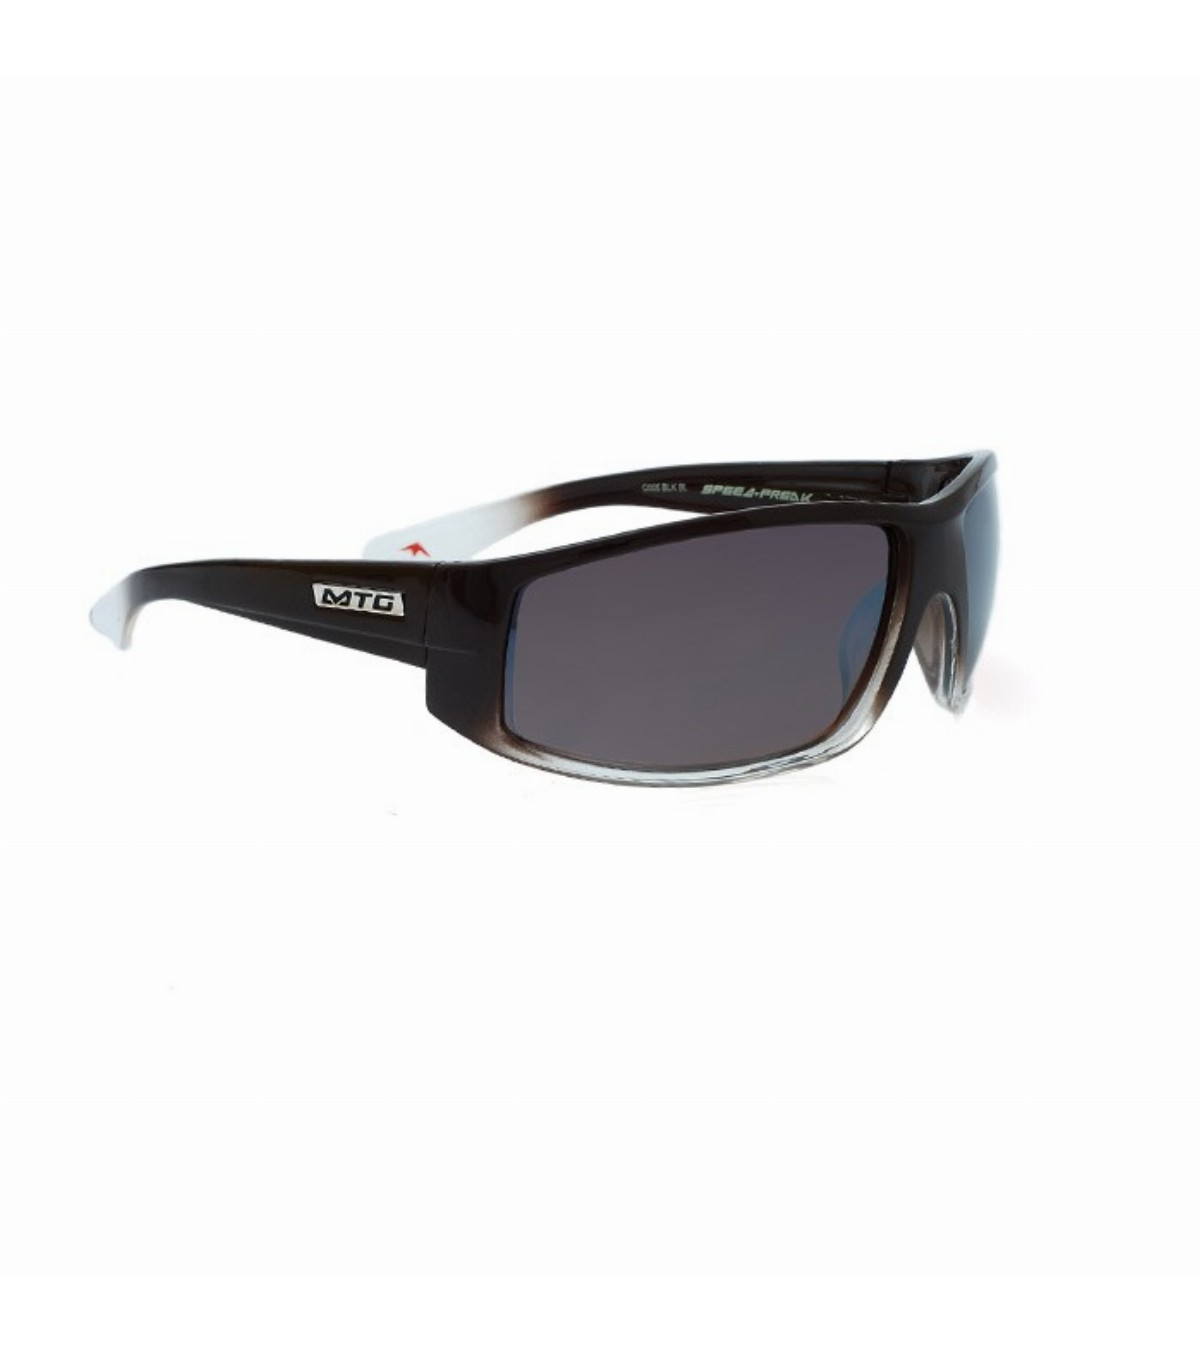 39726d3b2b Montagne: gafas hombres, anteojos para hombres, gafas de sol hombre ...